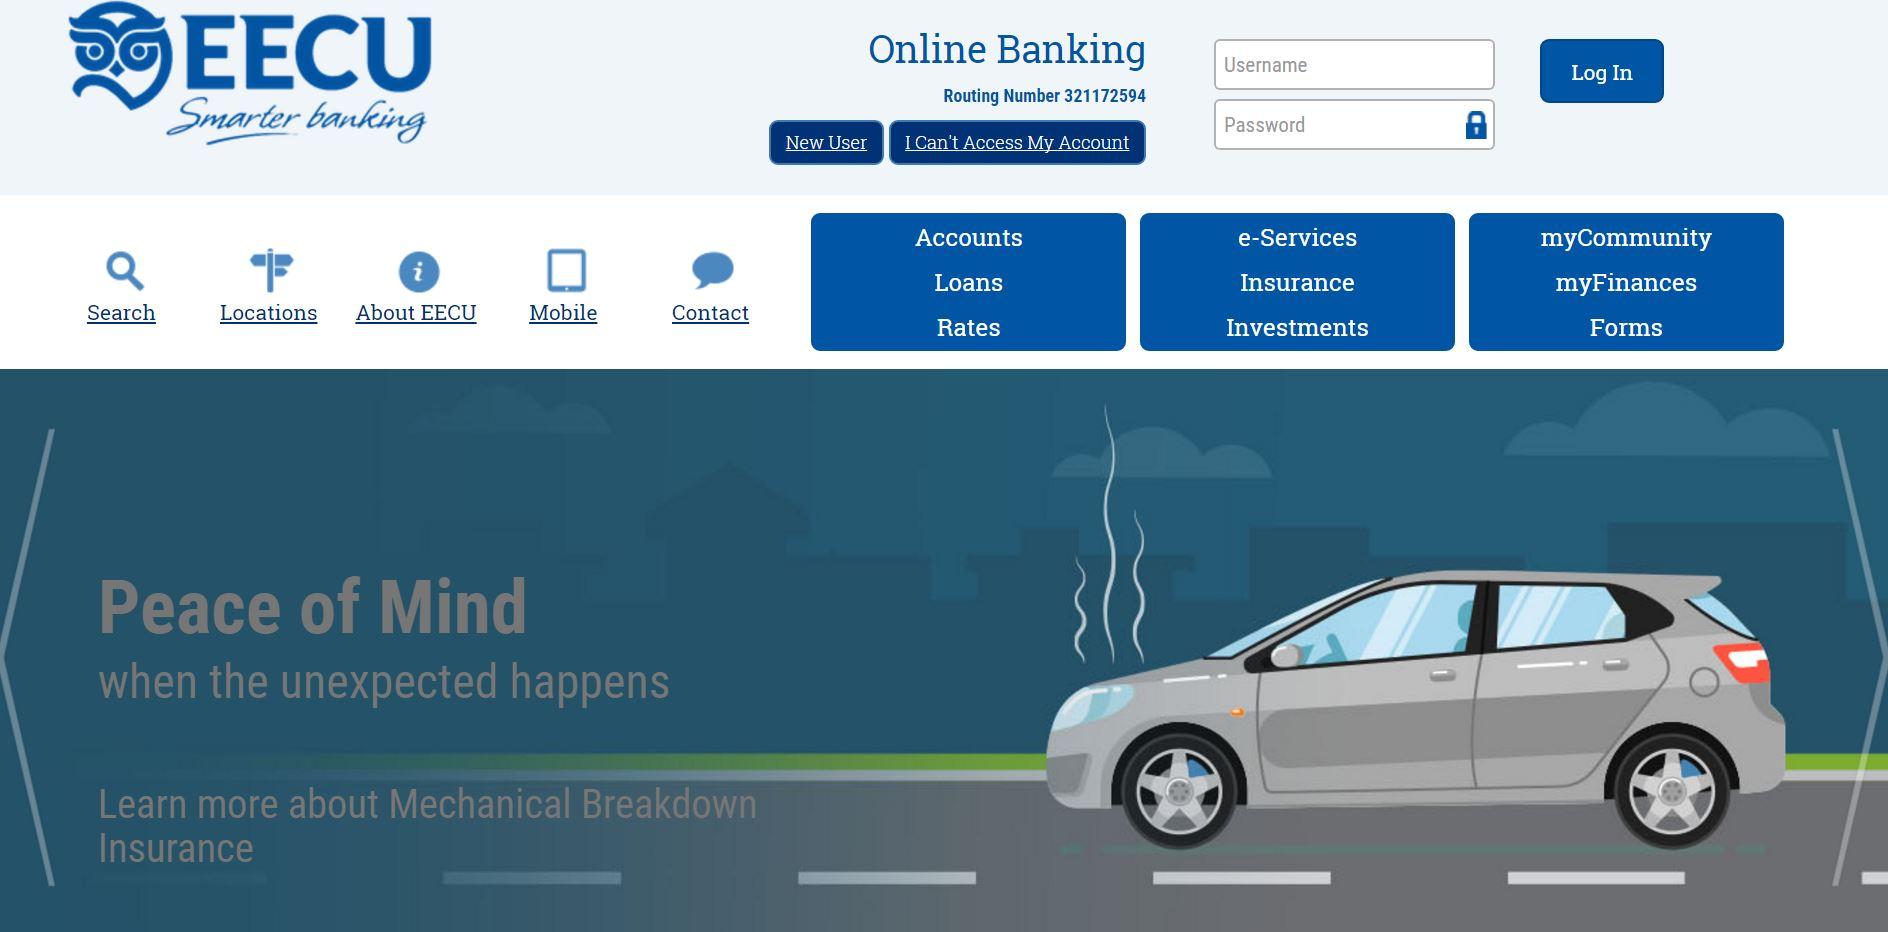 EECU frenso Online Bank login